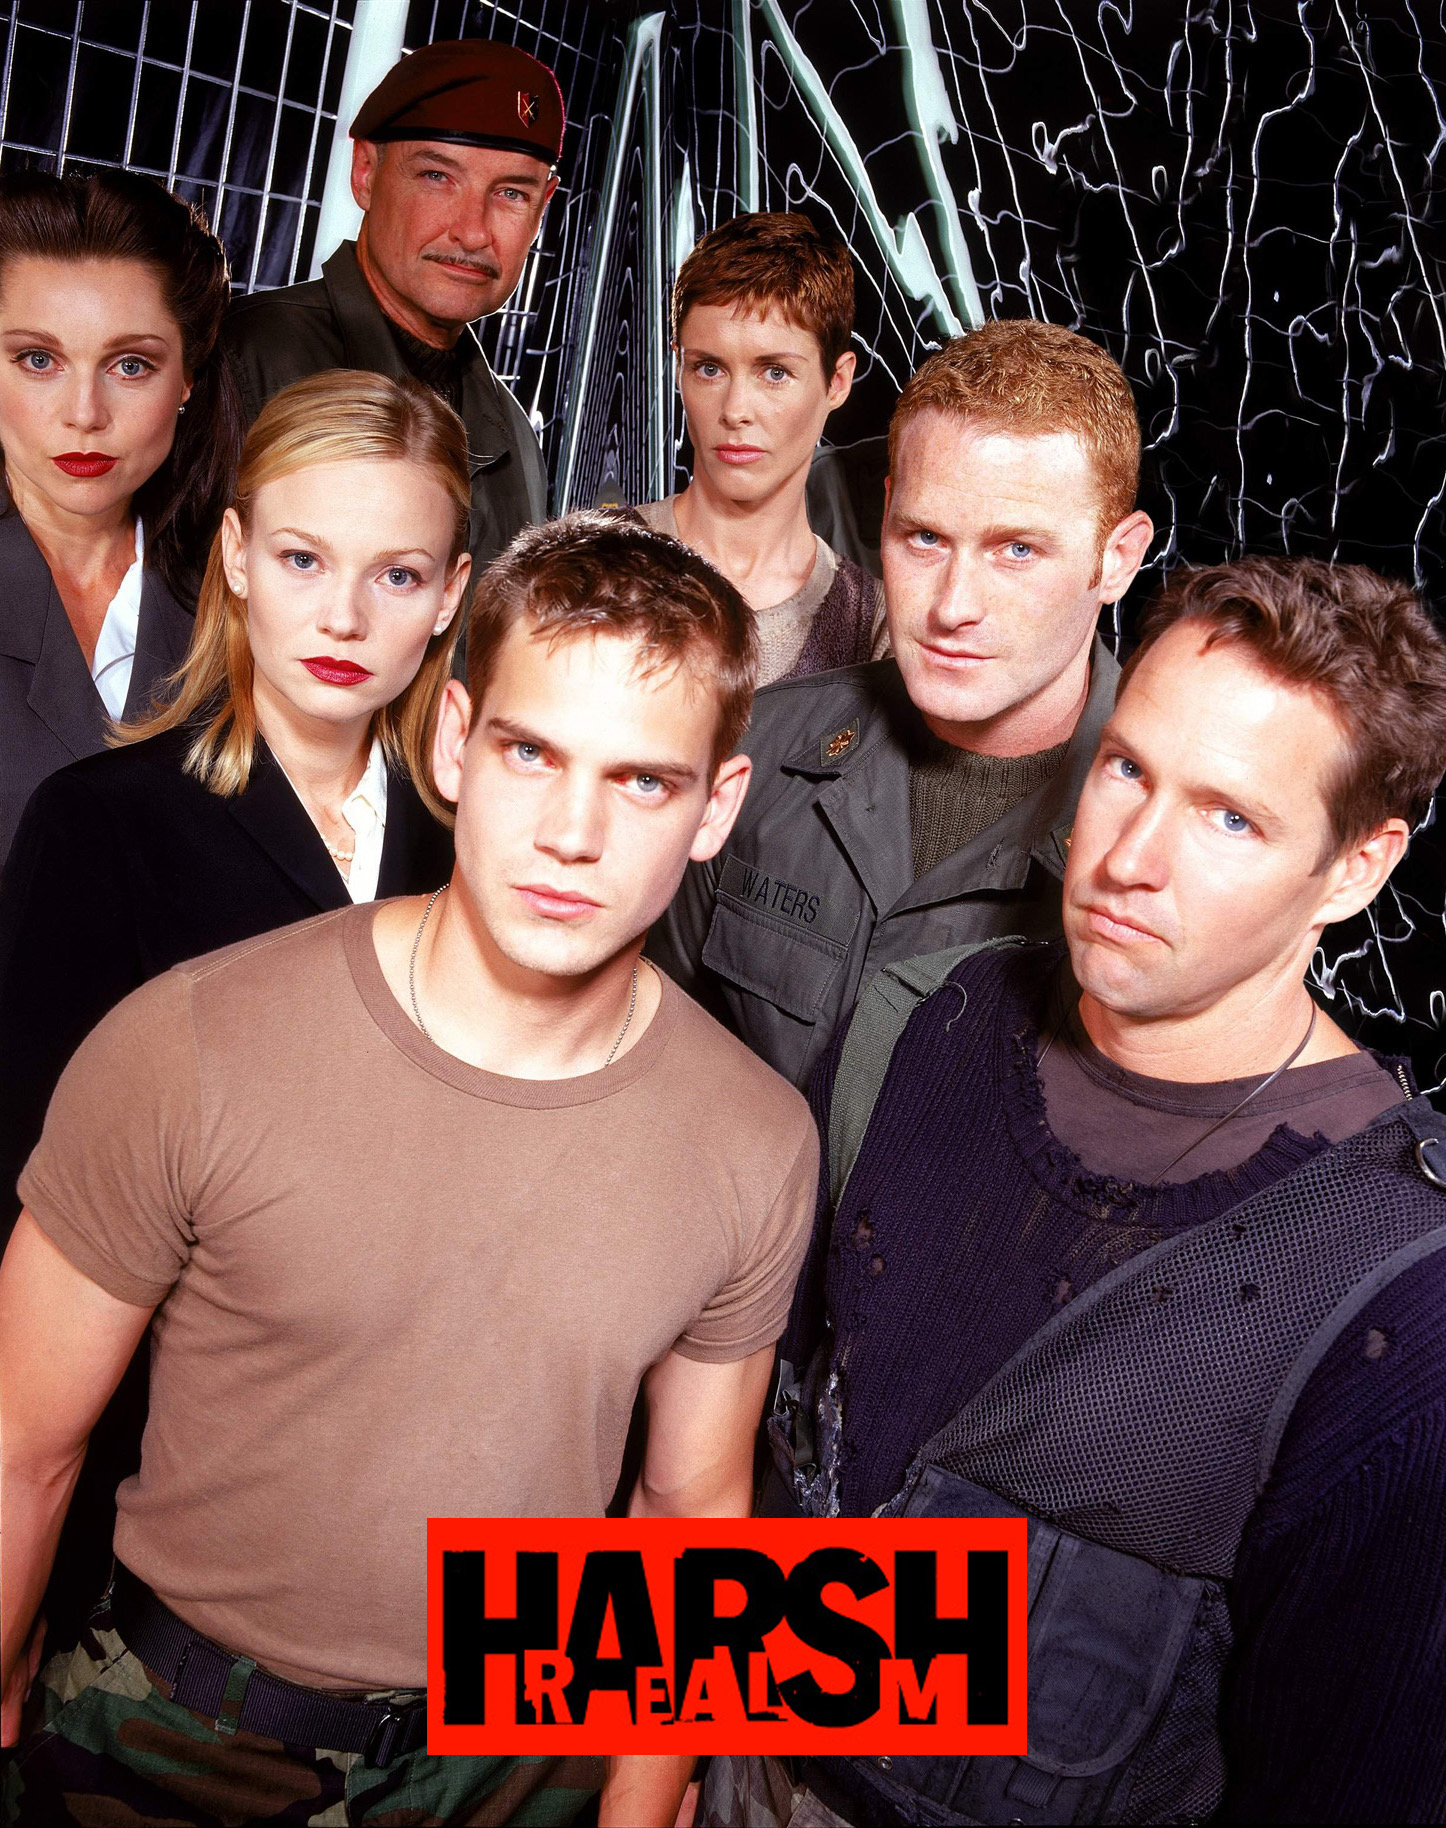 Scott Bairstow, Samantha Mathis, D.B. Sweeney, Max Martini, Rachel Hayward, Terry O'Quinn, and Sarah-Jane Redmond in Harsh Realm (1999)